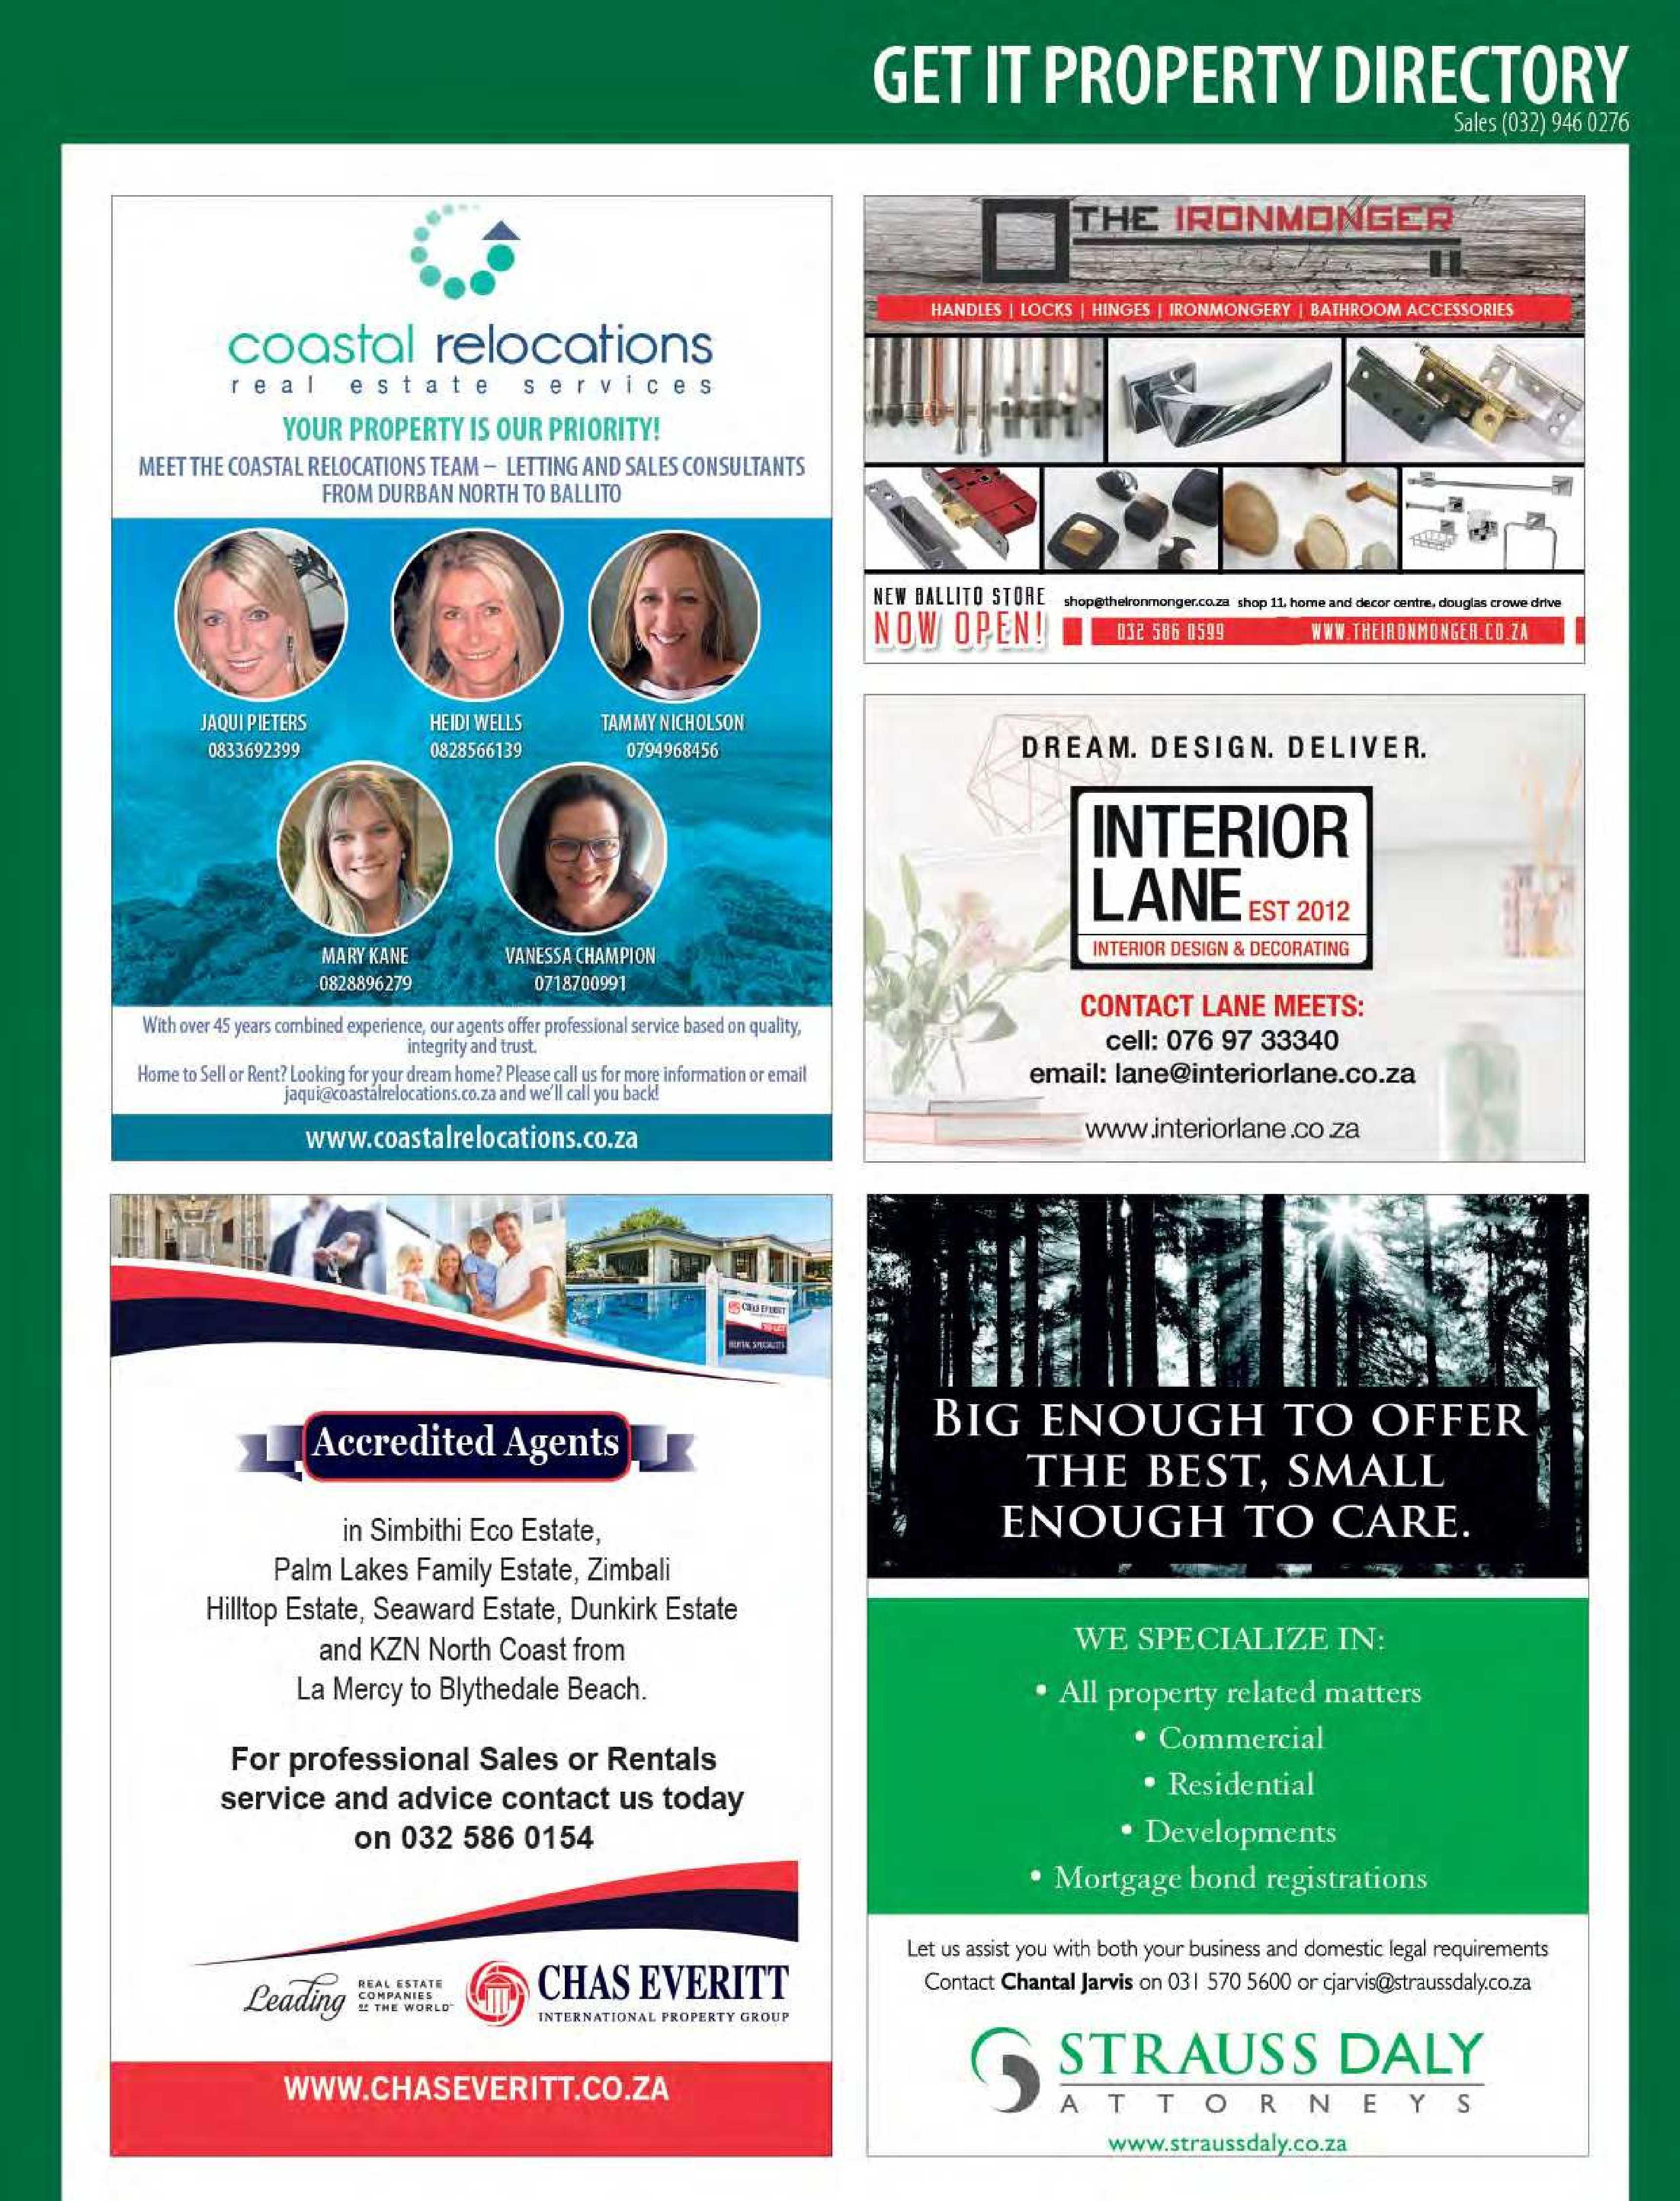 get-magazine-ballitoumhlanga-december-2017-january-2018-2-epapers-page-117